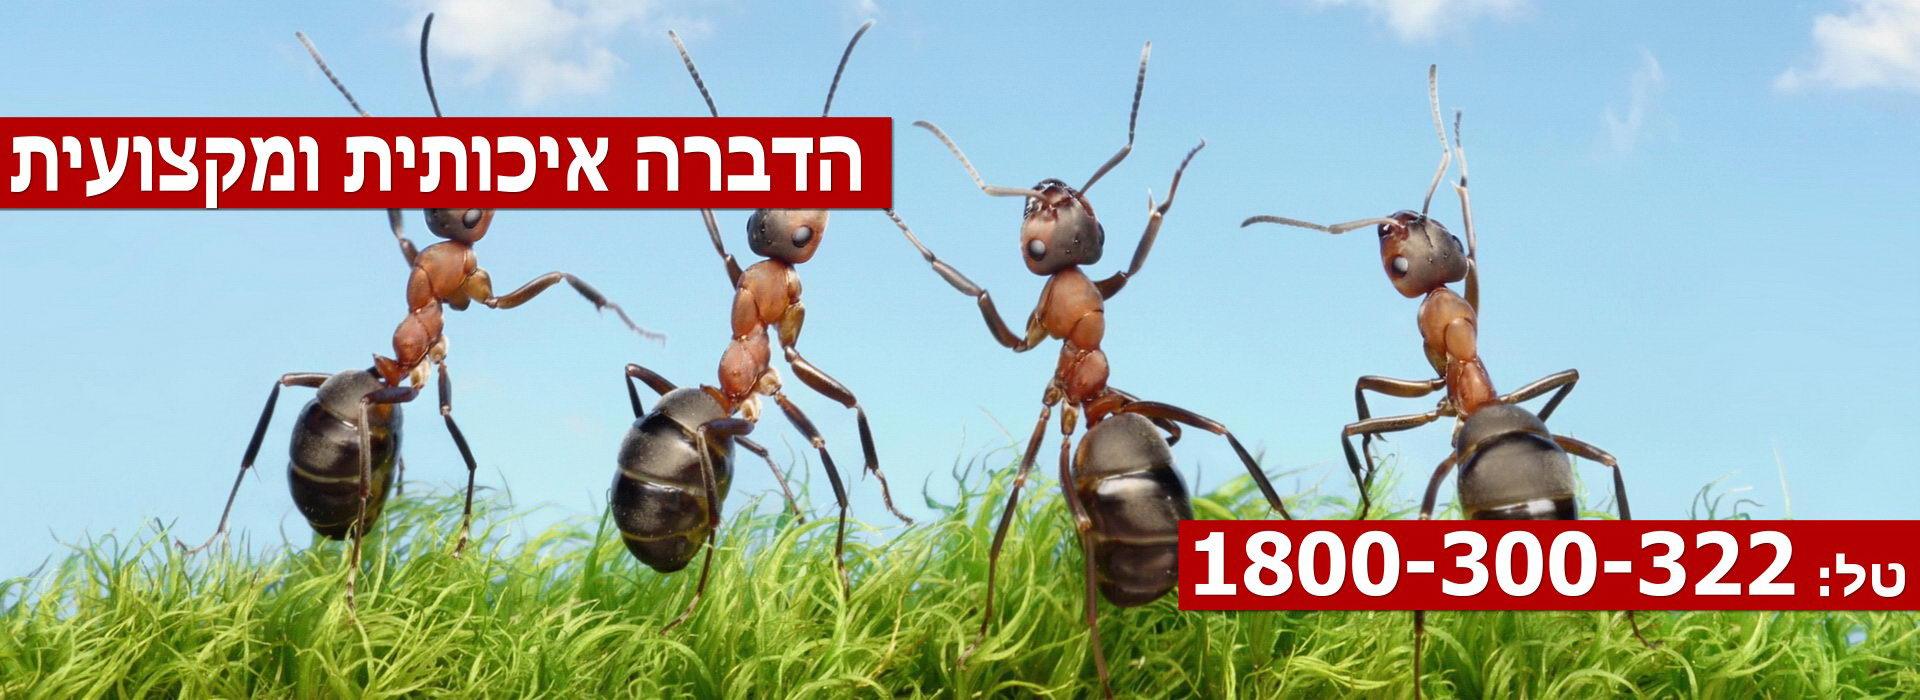 Pest-Control-Haifa-Slider2